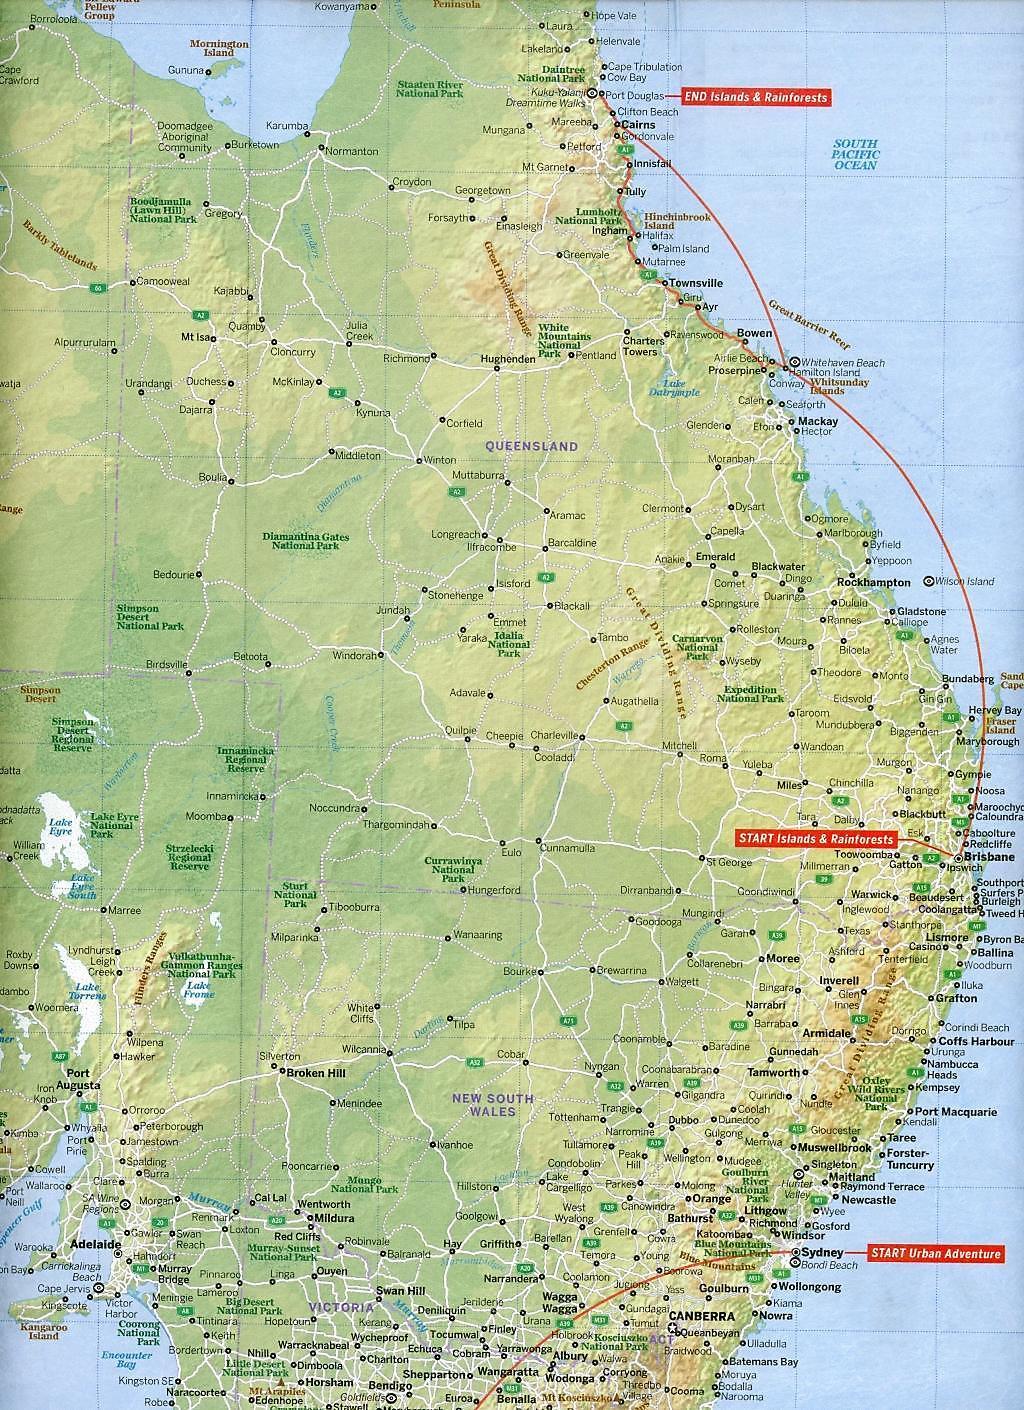 Lonely Planet Australia Planning Map Buch bestellen - Weltbild.de